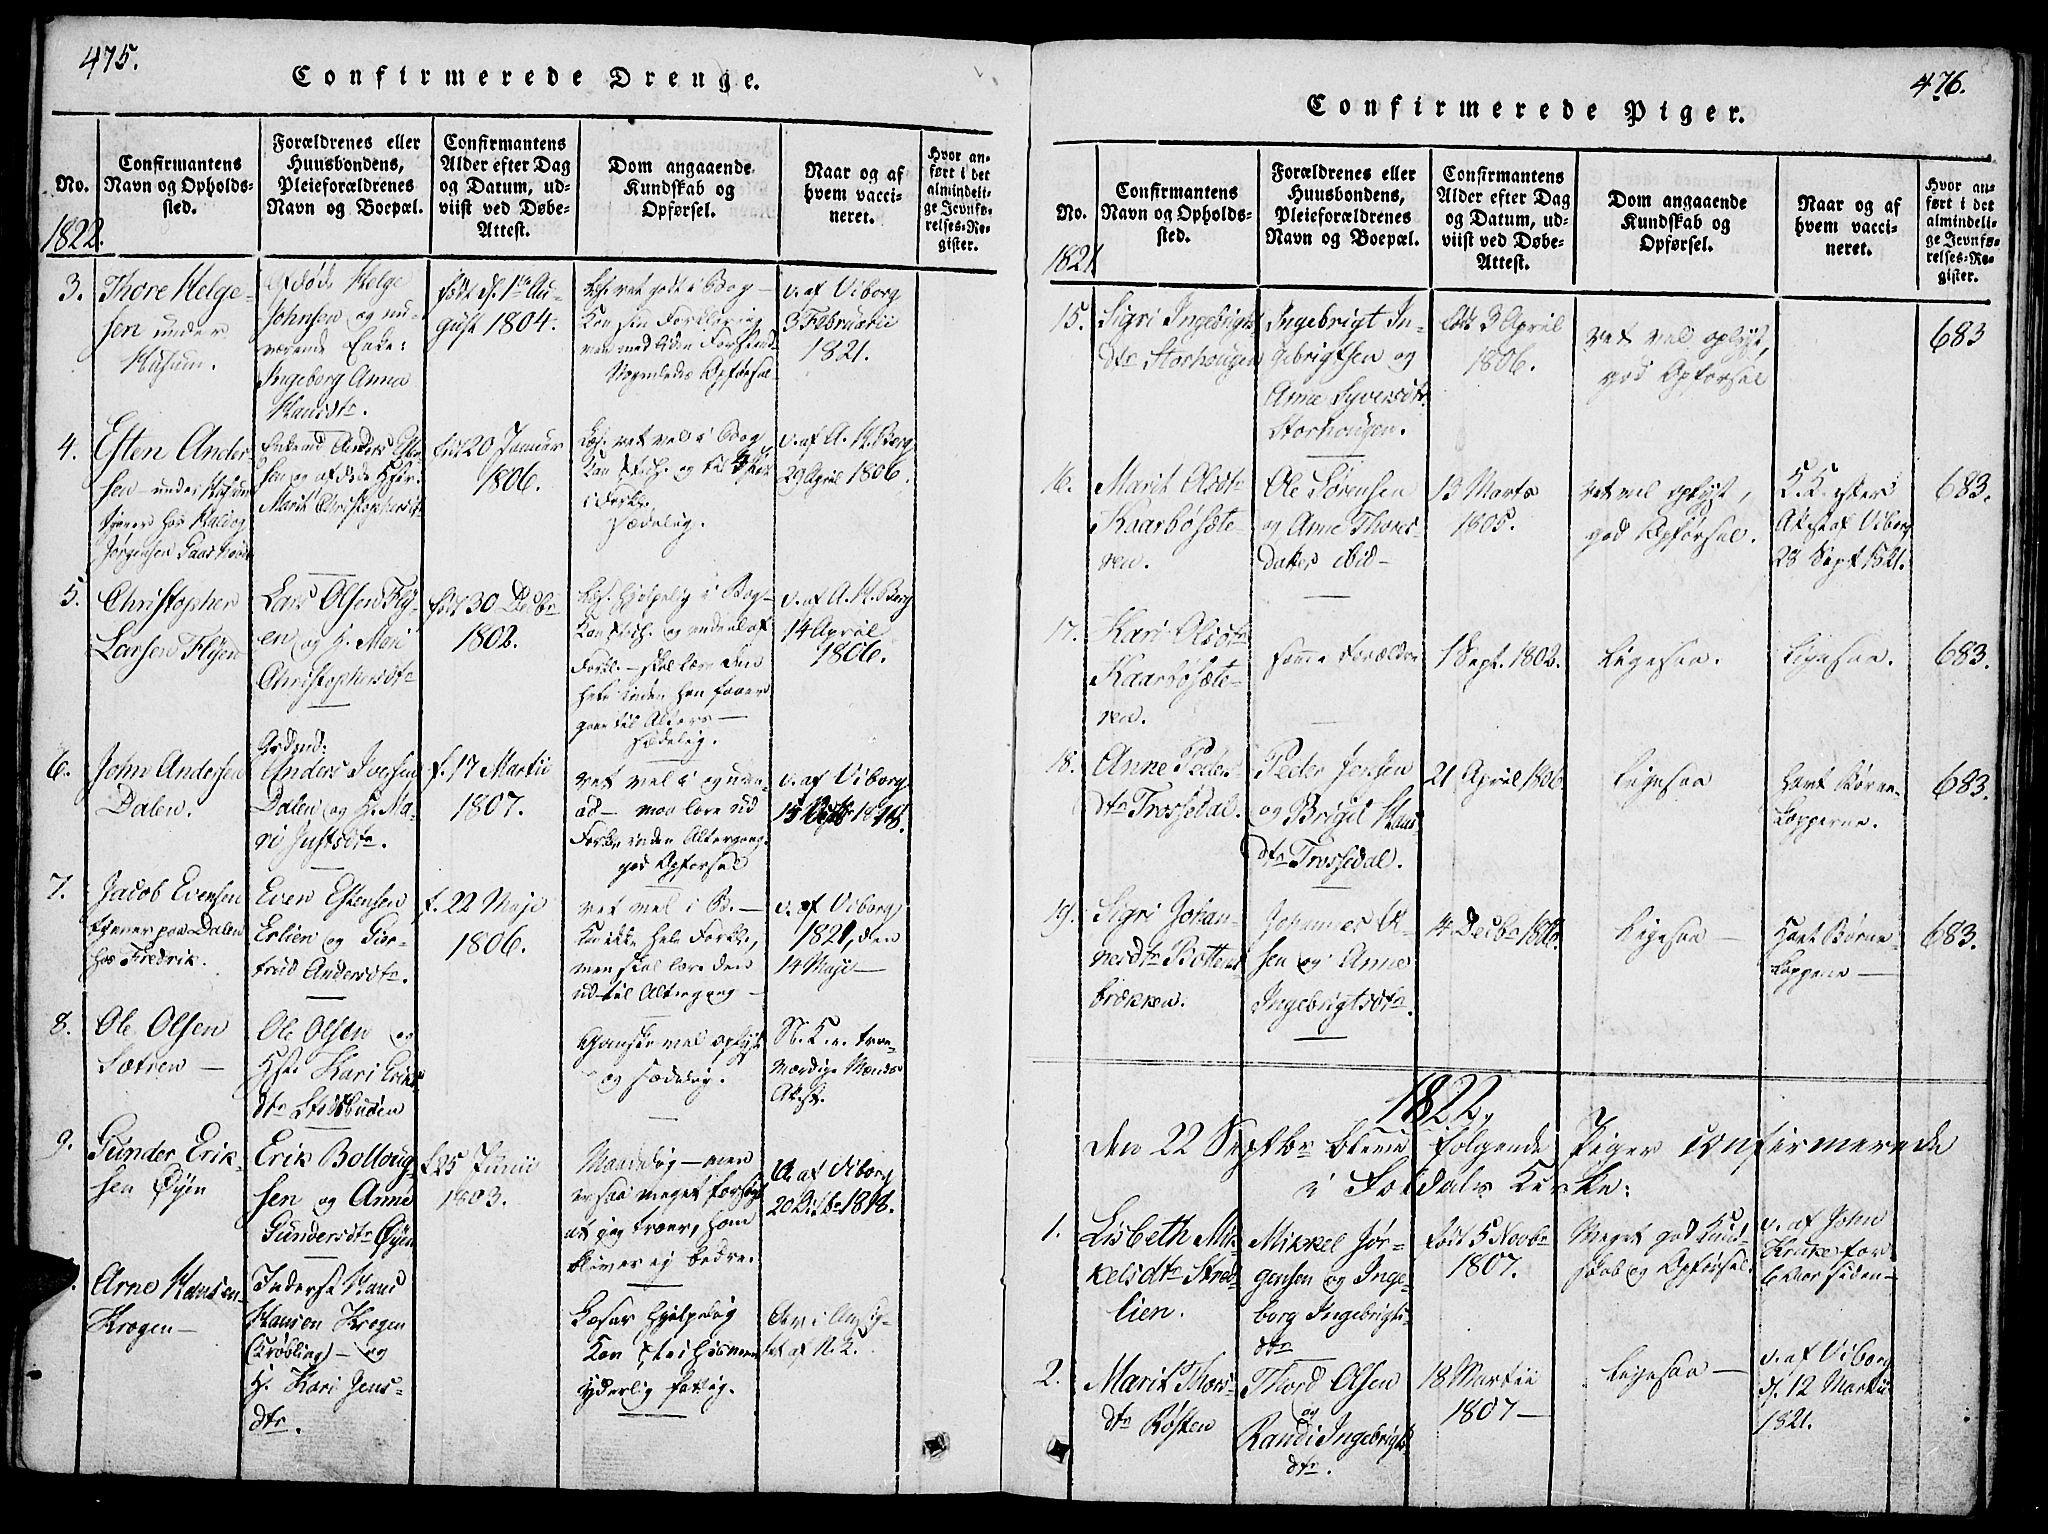 SAH, Lesja prestekontor, Ministerialbok nr. 4, 1820-1829, s. 475-476